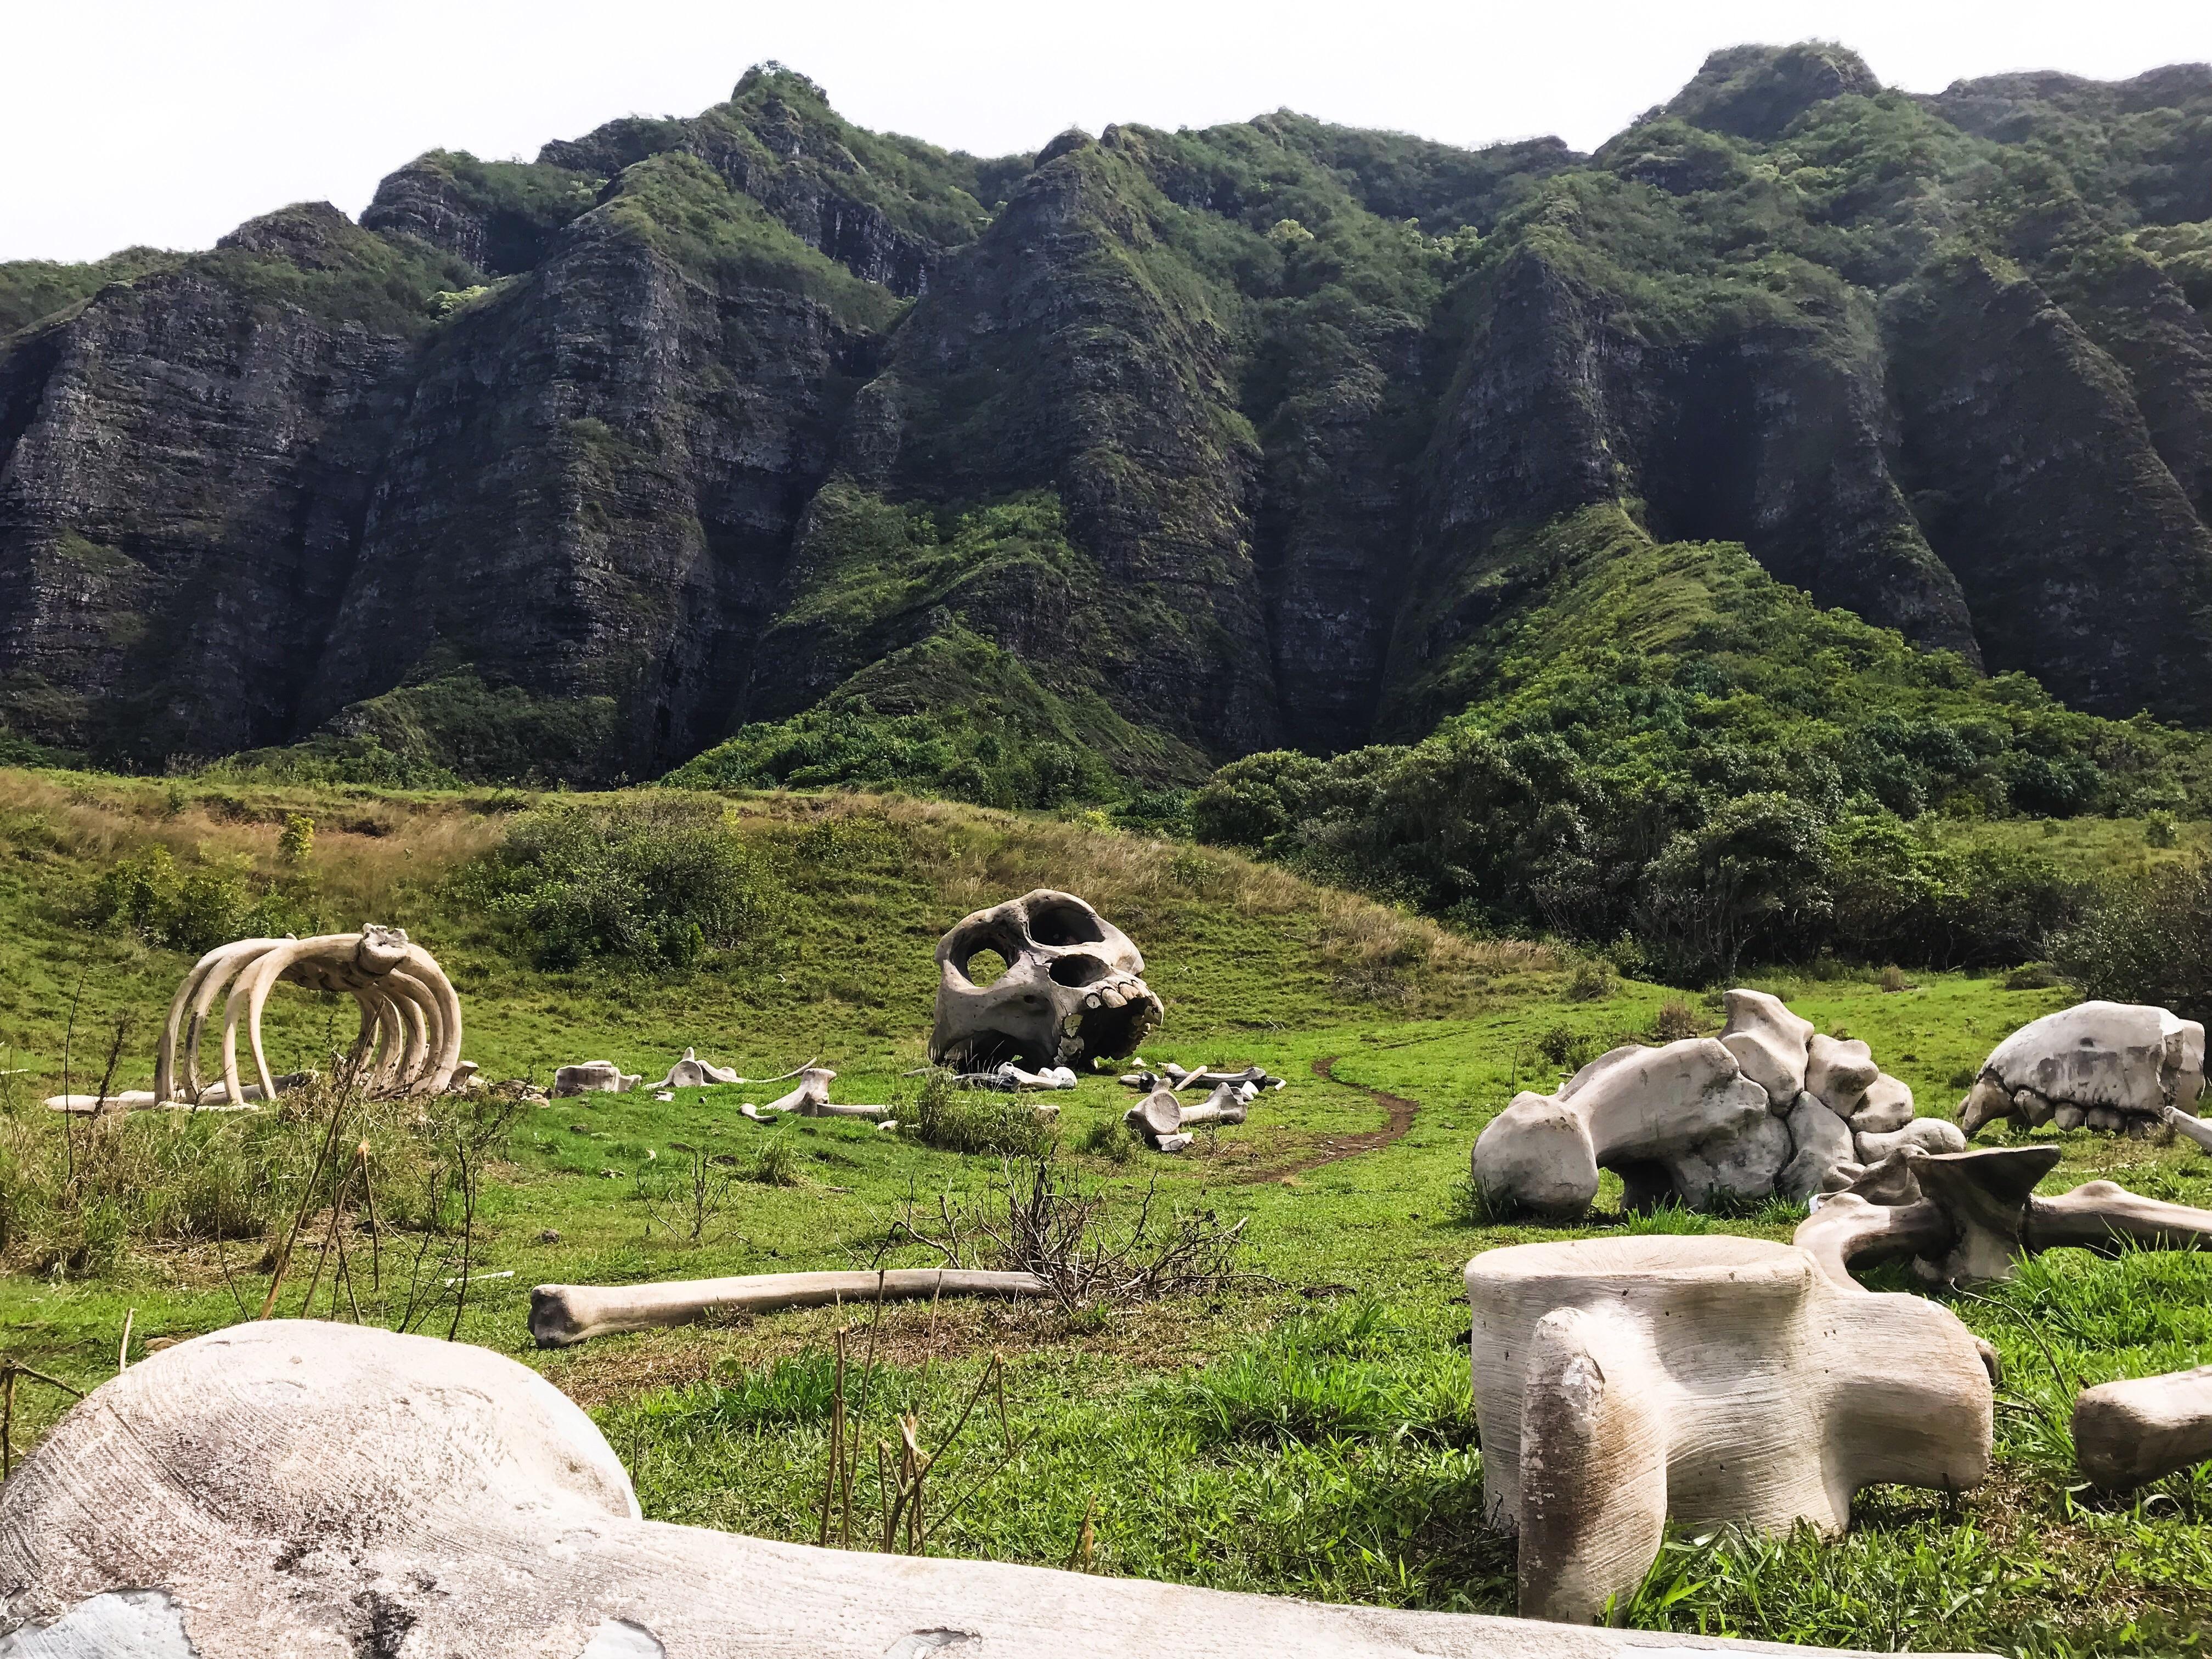 Filming location for kong skull island in oahu hawaii